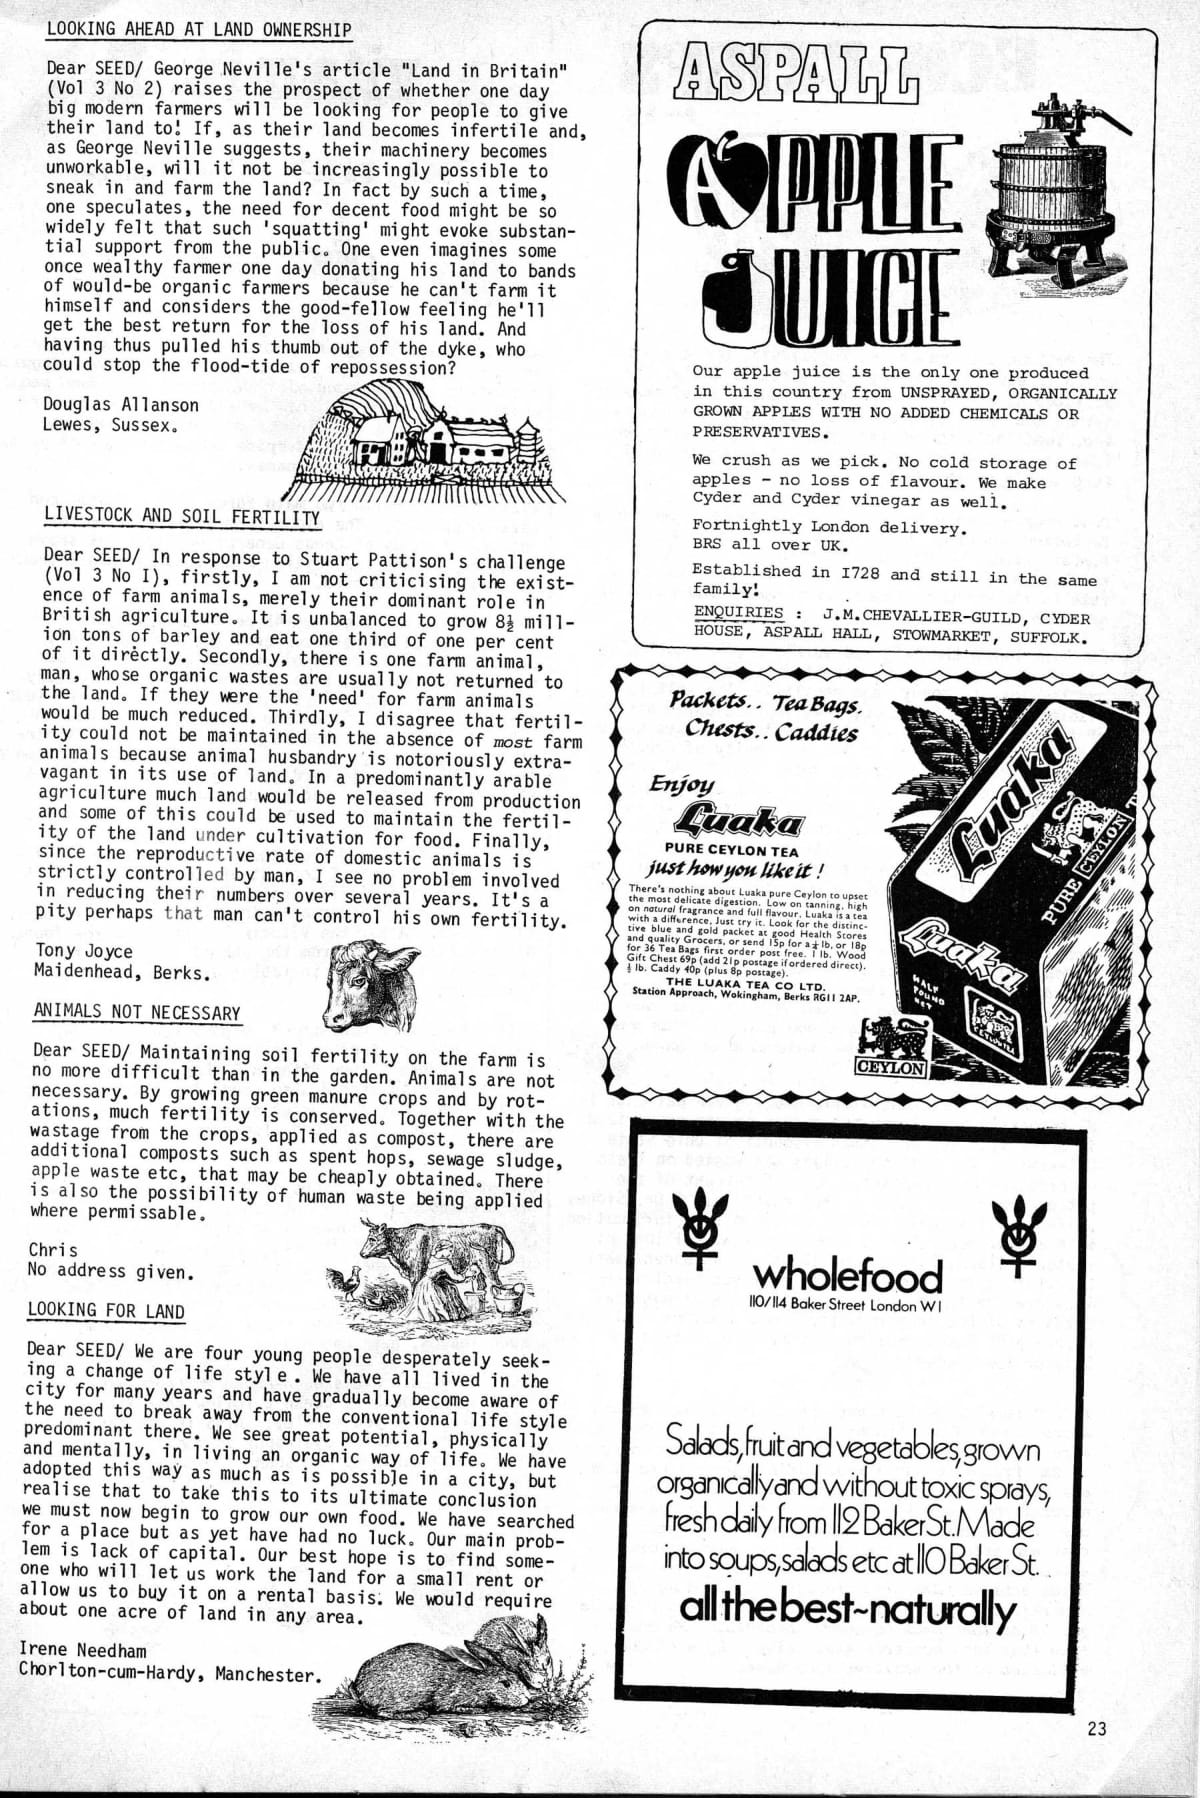 seed-v3-n4-april1974-23.jpg